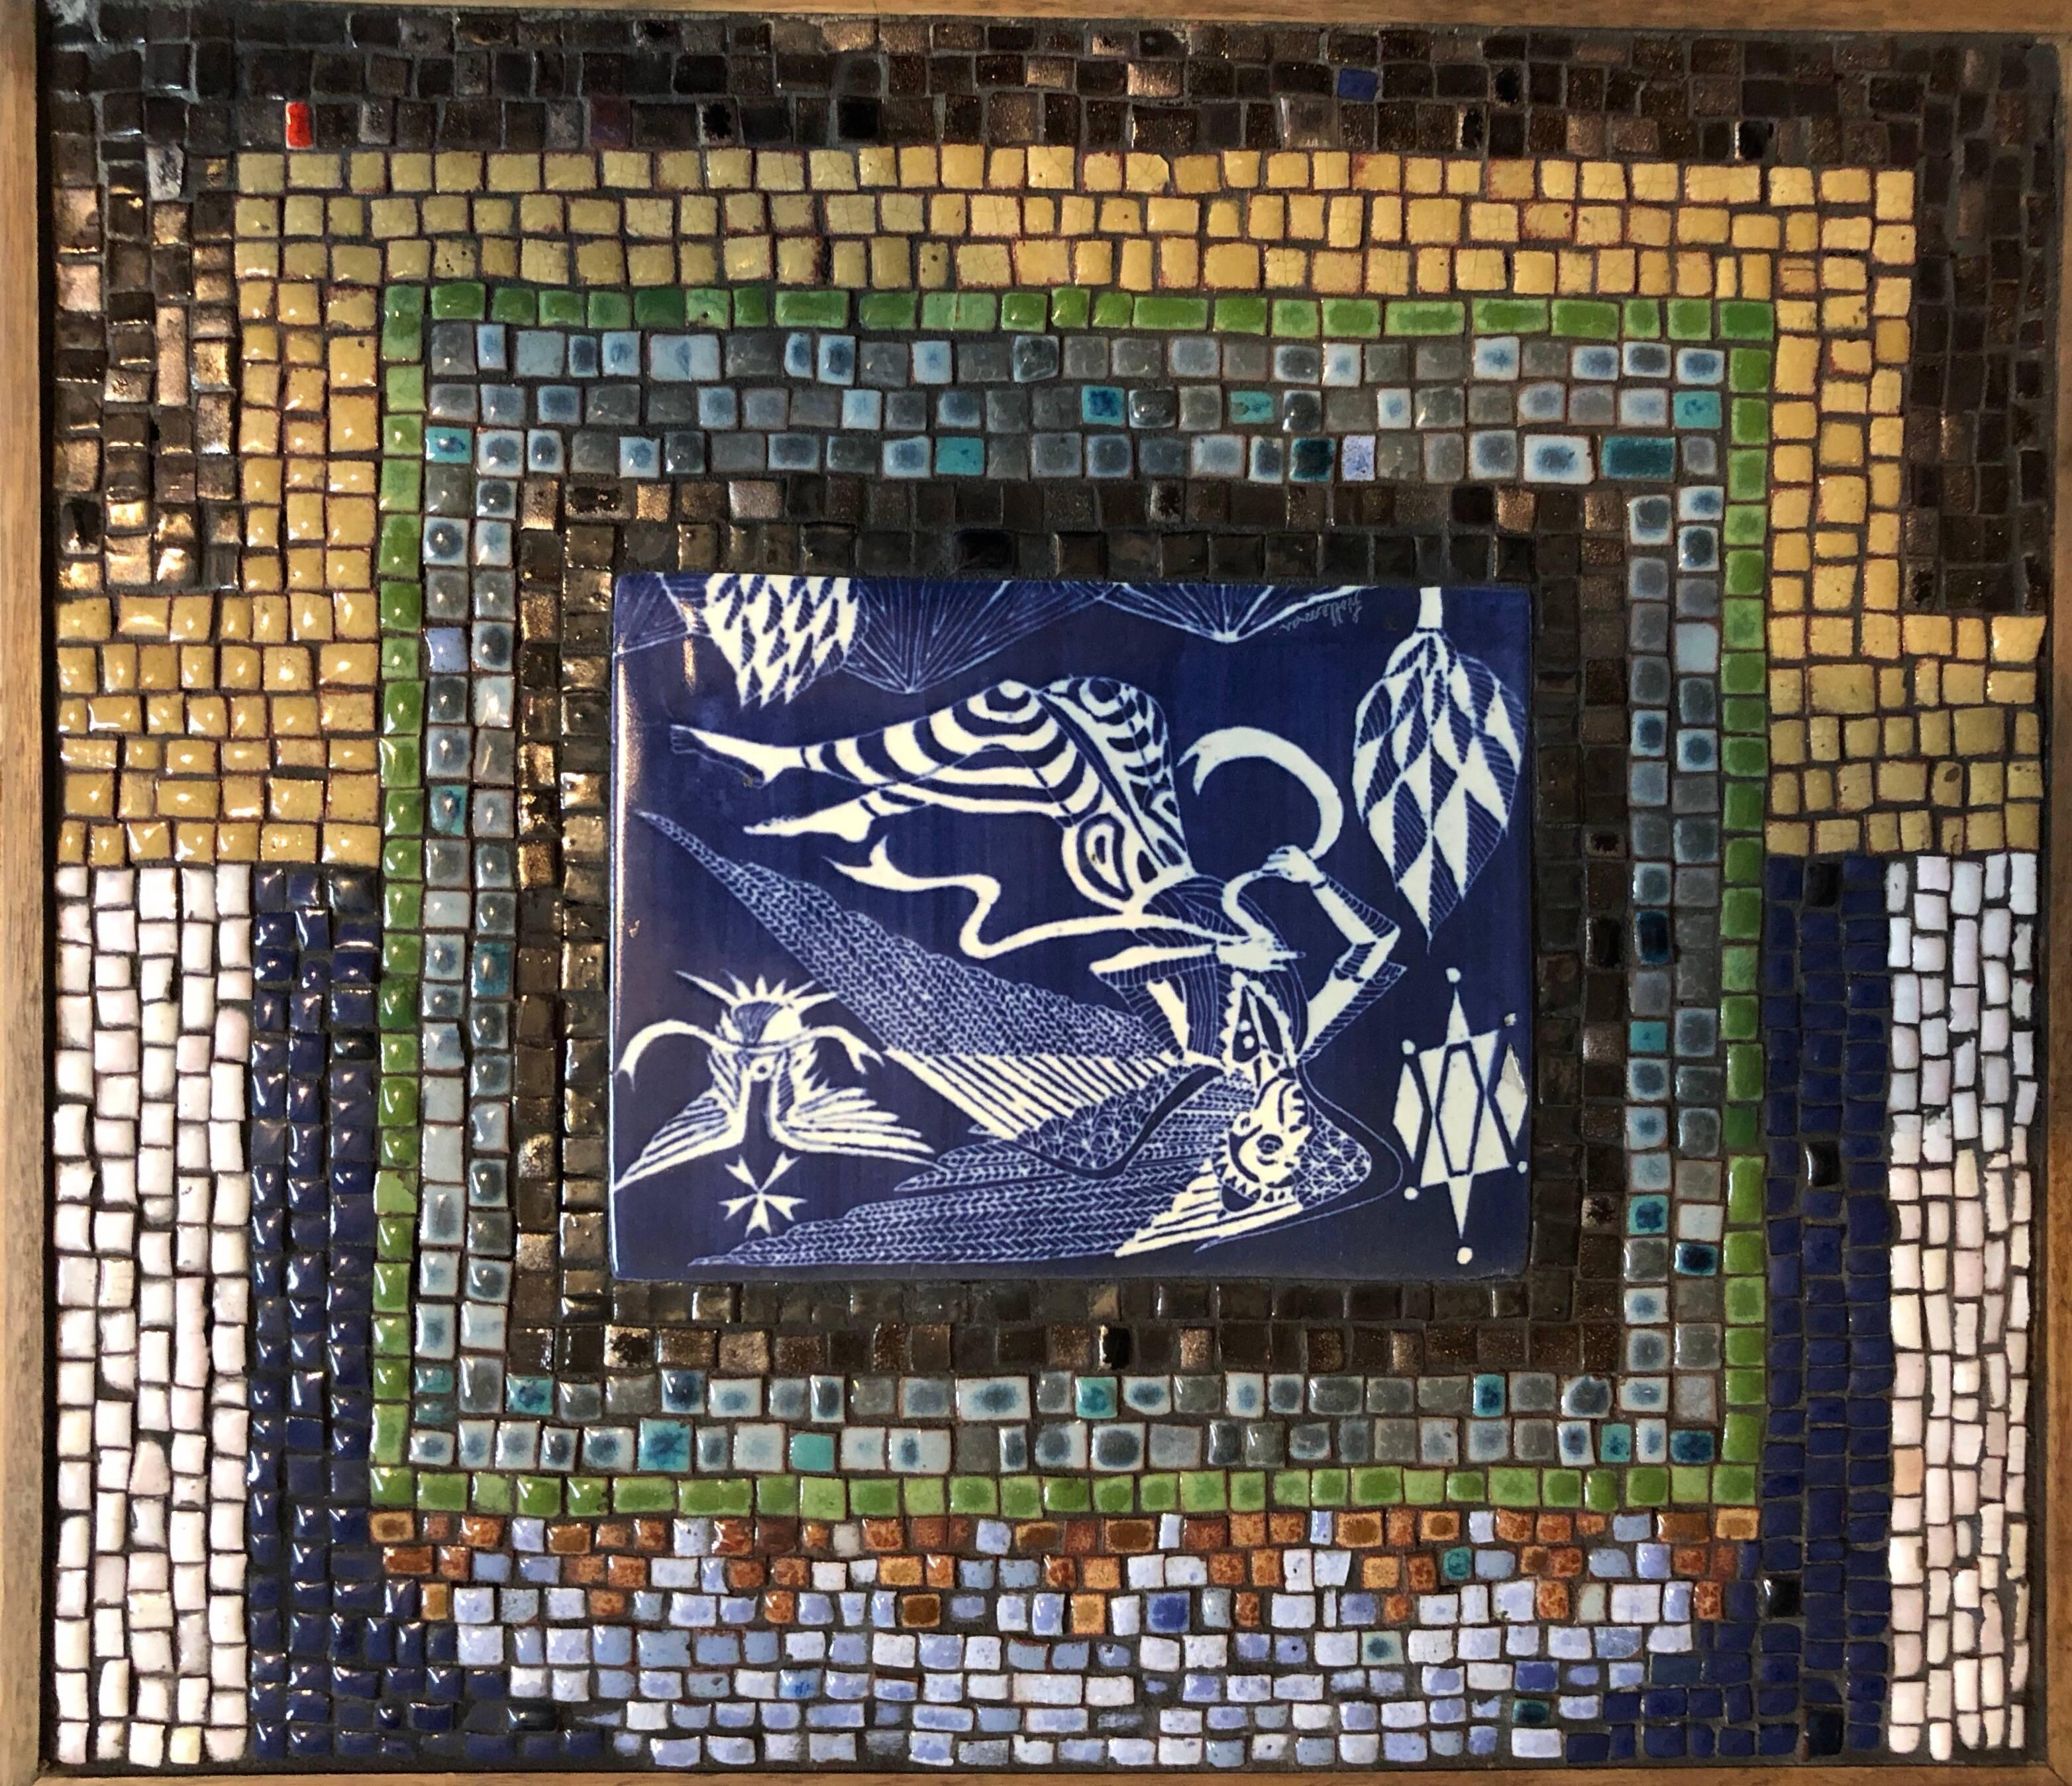 Rare Vintage Judaica Tile Mosaic with Sgraffito Hebrew Calligraphy